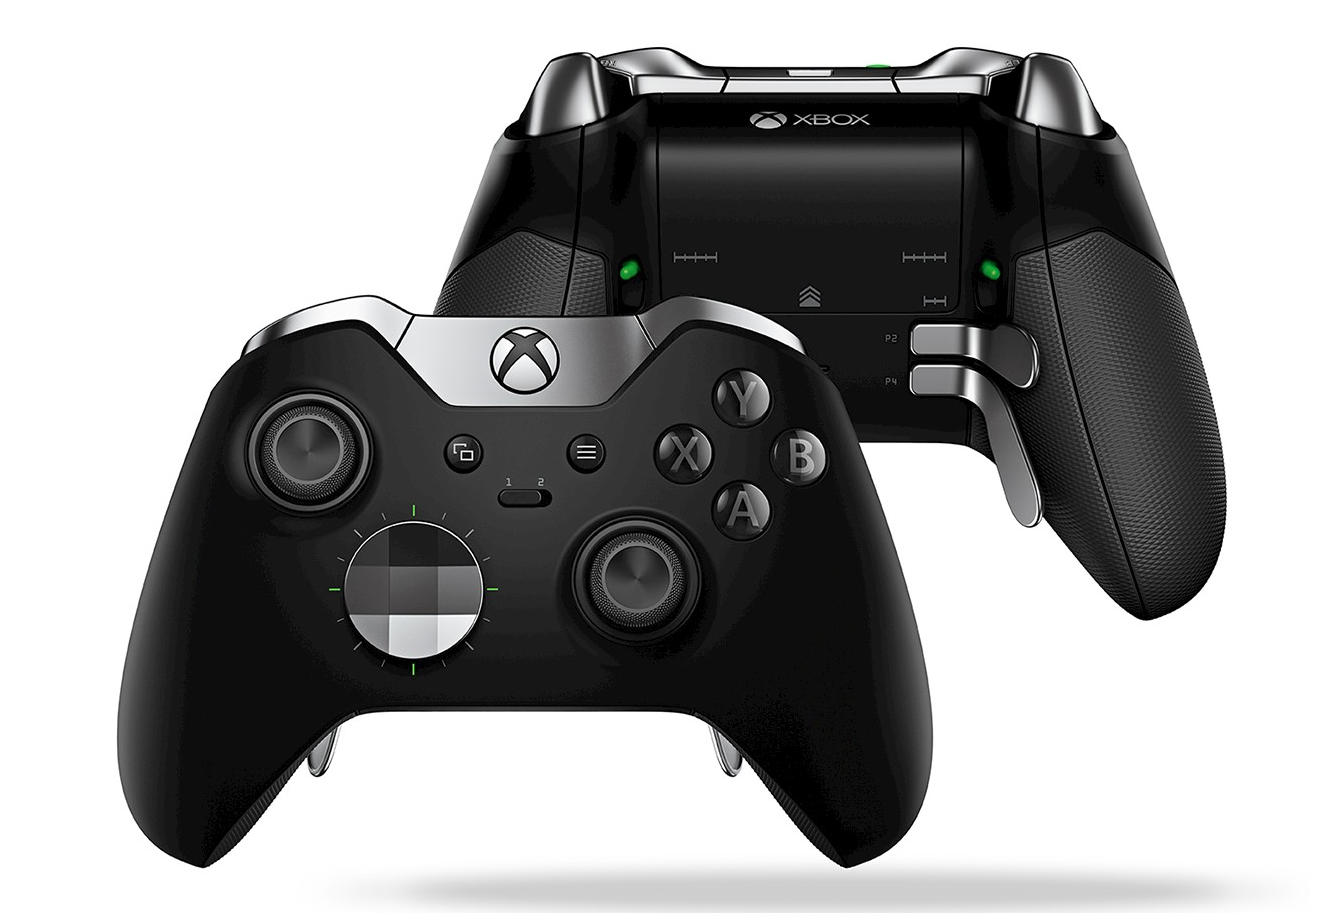 xbox one, elite, elite controller, pro controller, wireless